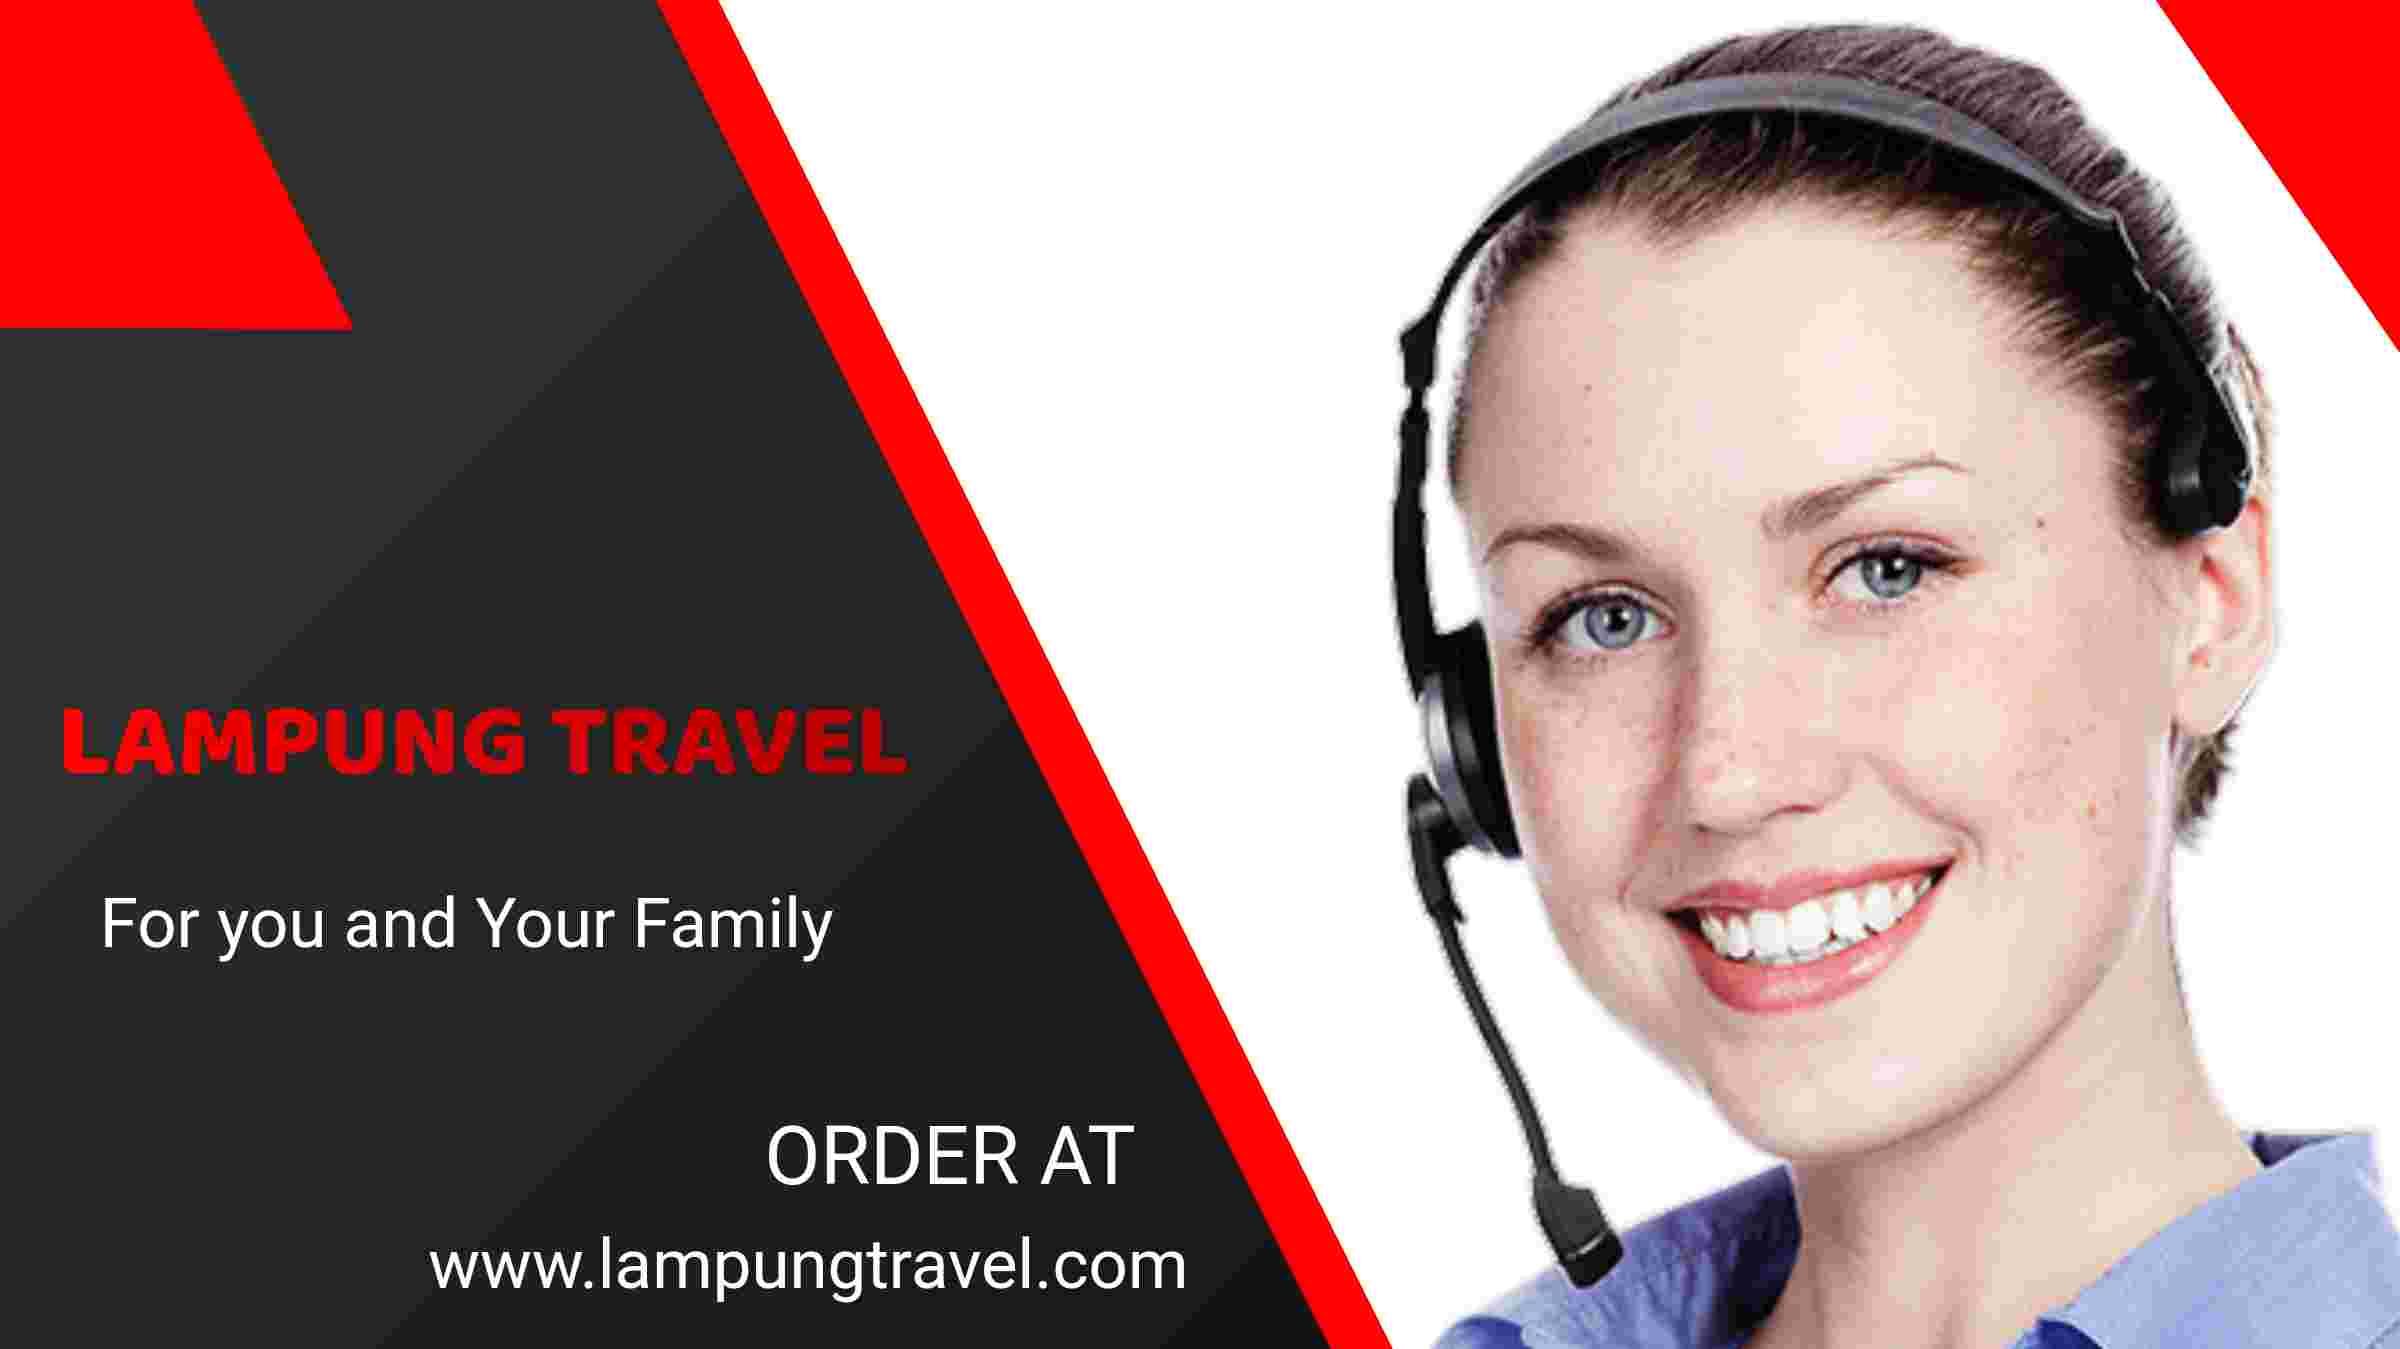 Travel Serpong Lubuk Linggau Terpercaya